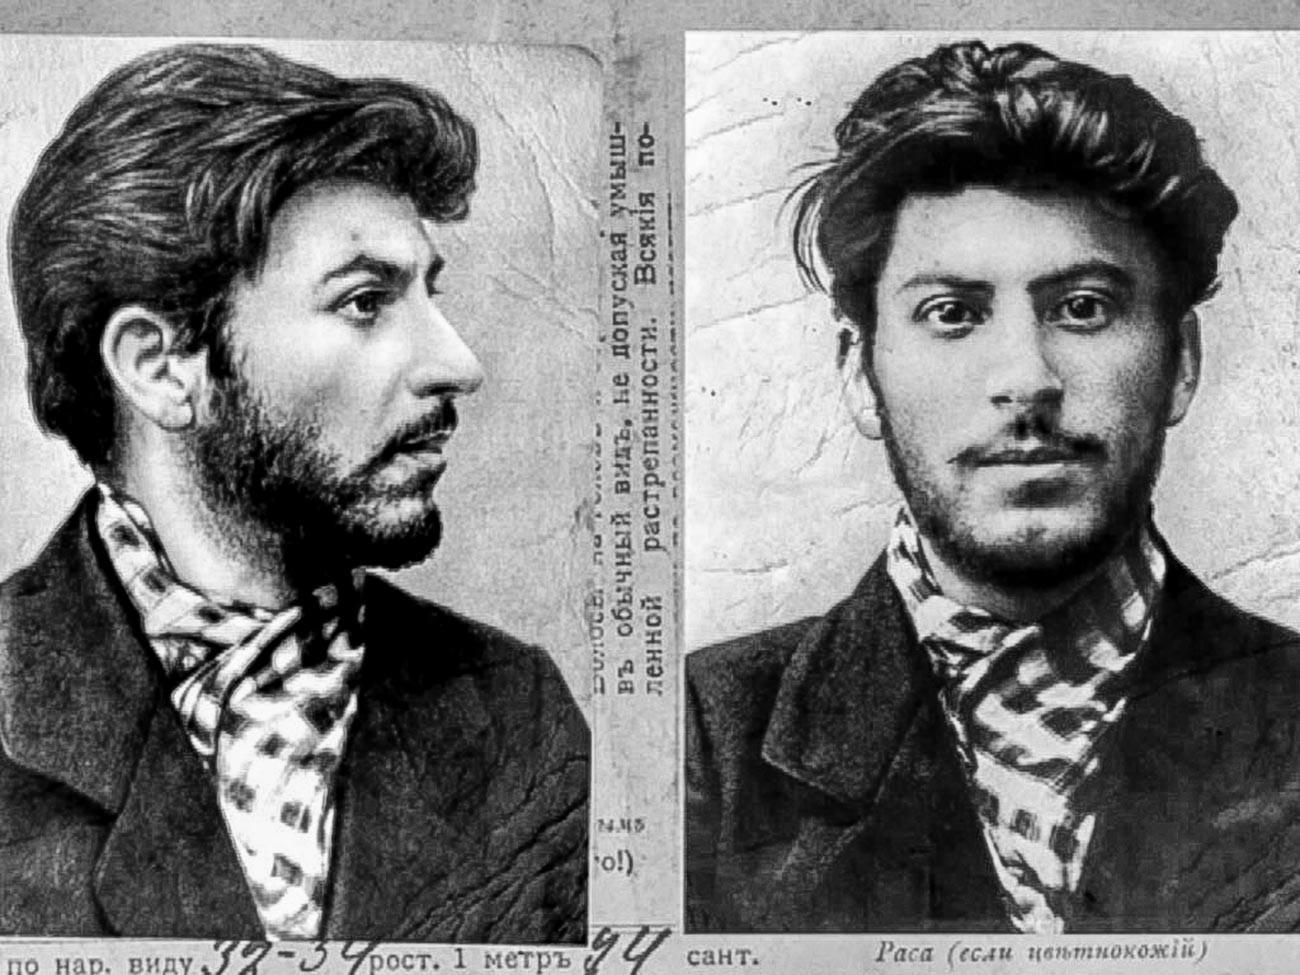 23-годишният Сталин, полицейско досие, 1902 г.